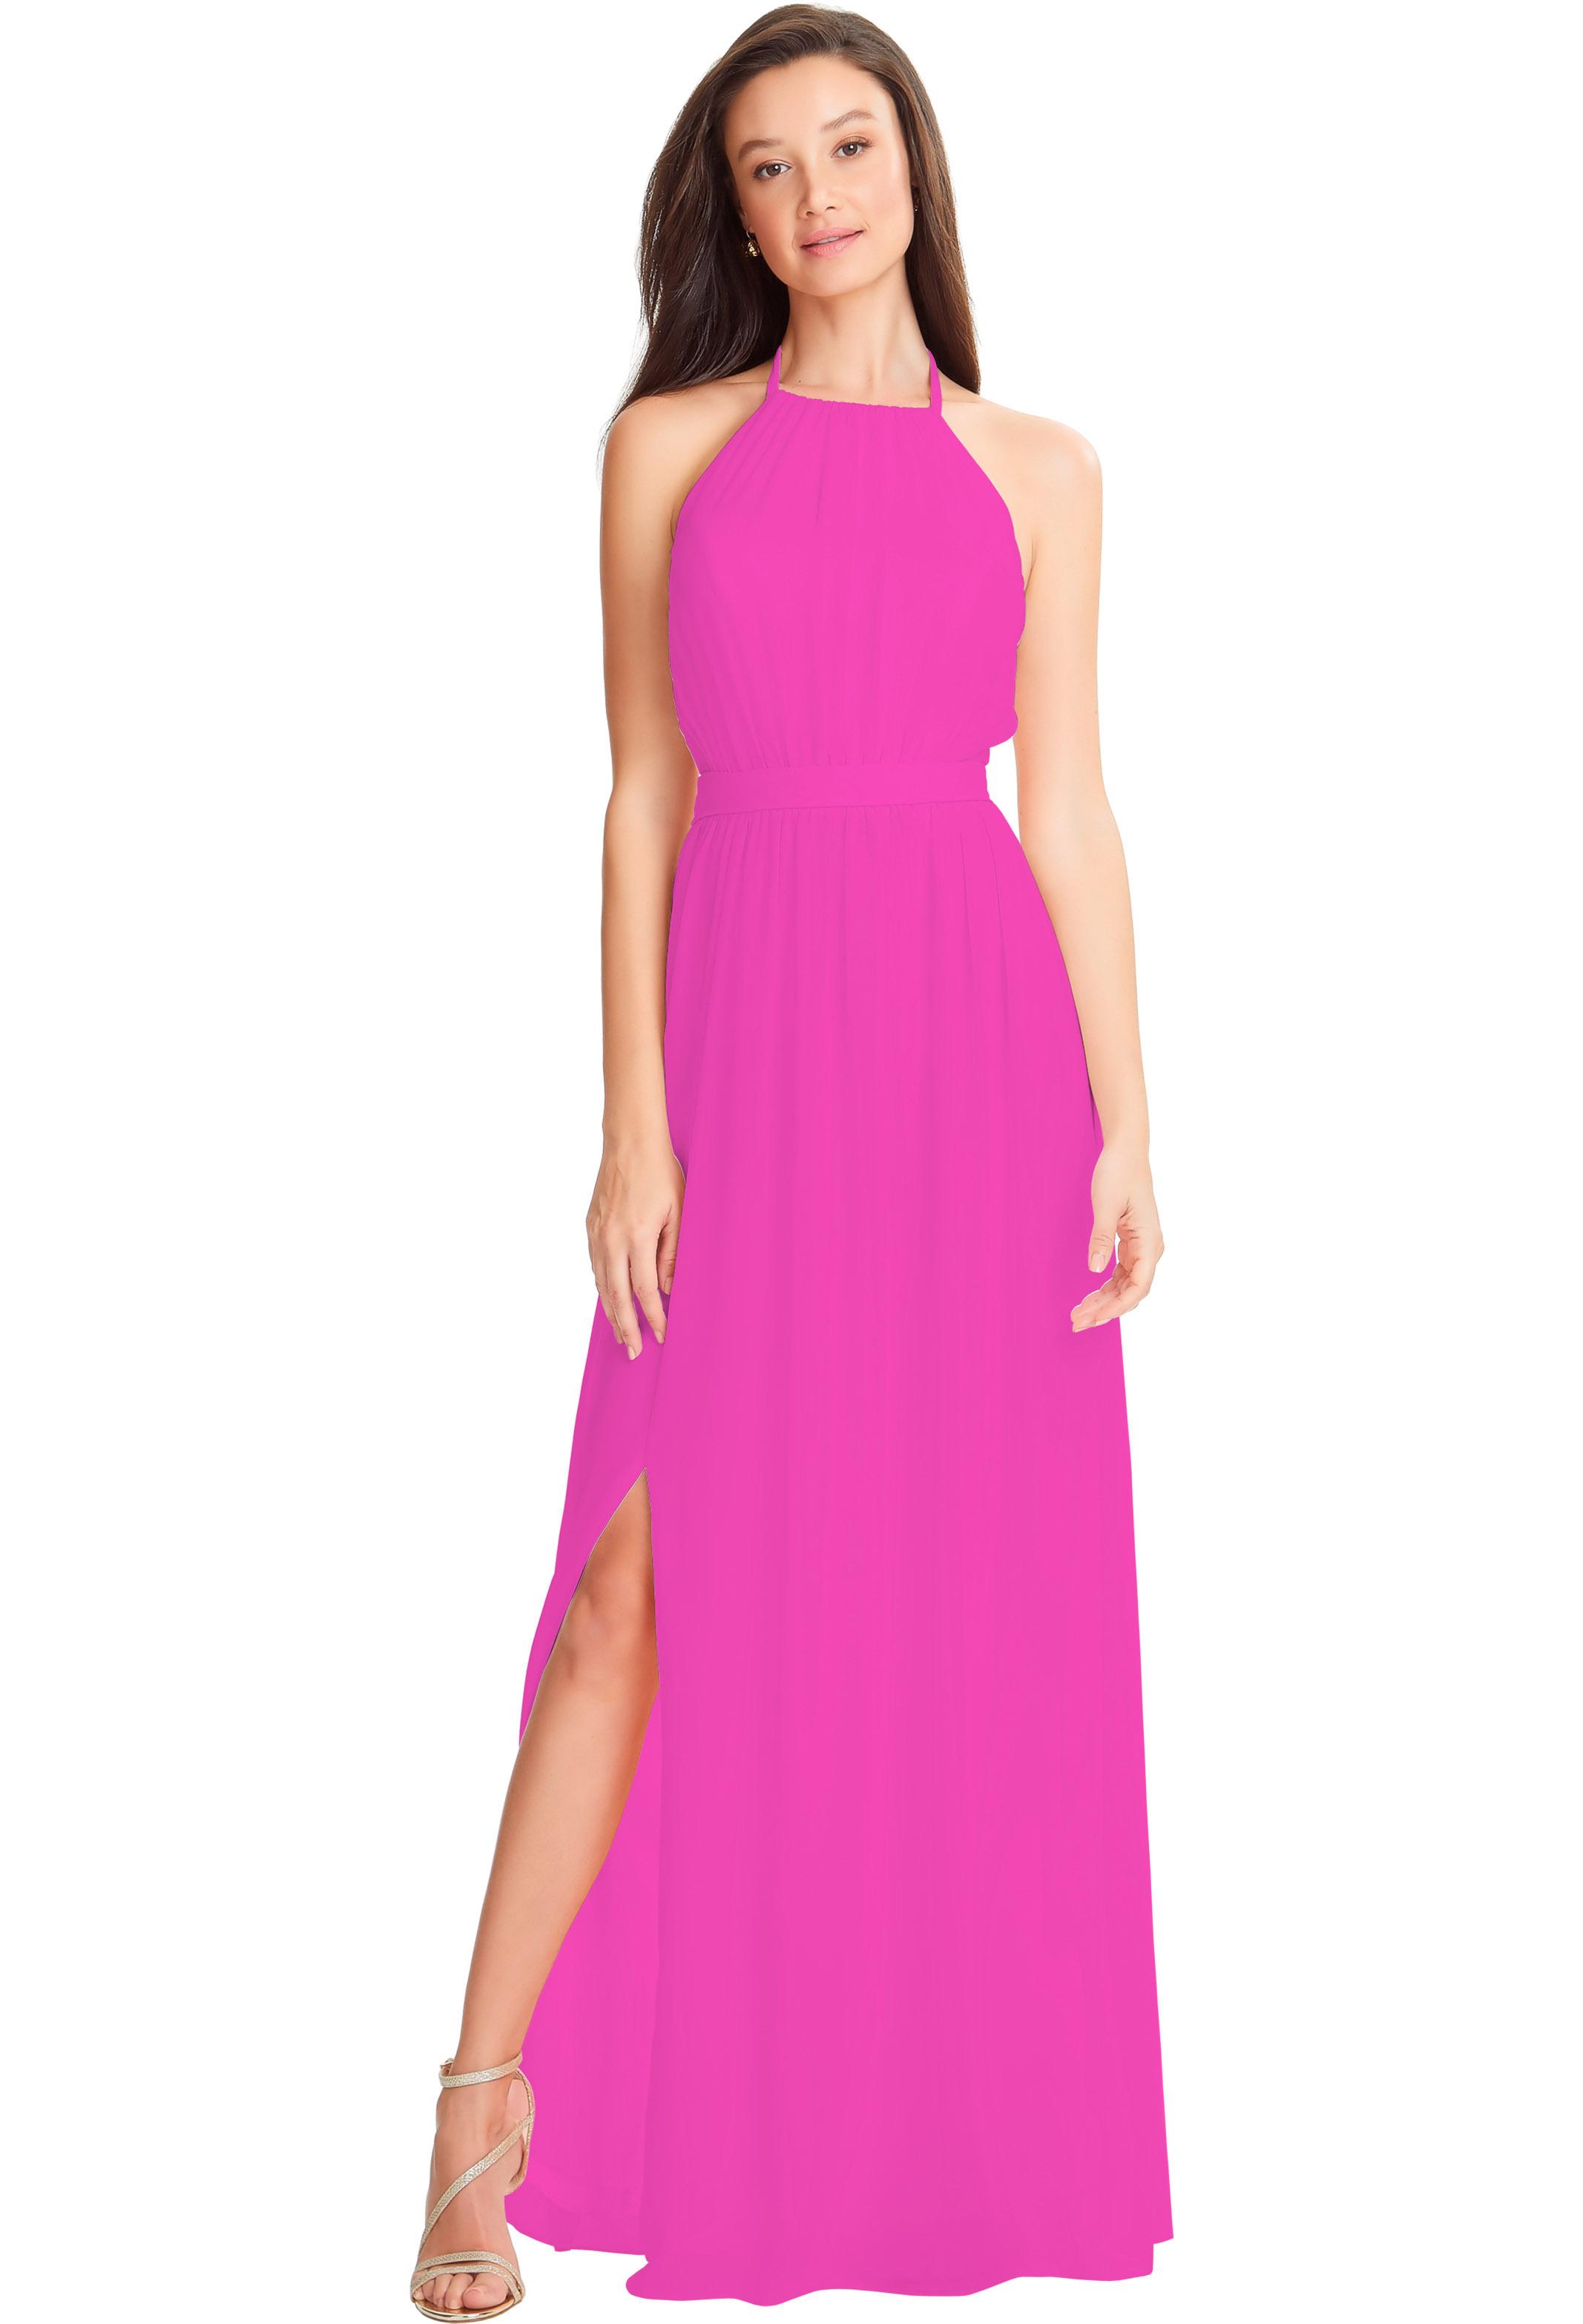 Bill Levkoff SANGRIA Chiffon Spaghetti Strap Side Slit gown, $178.00 Front